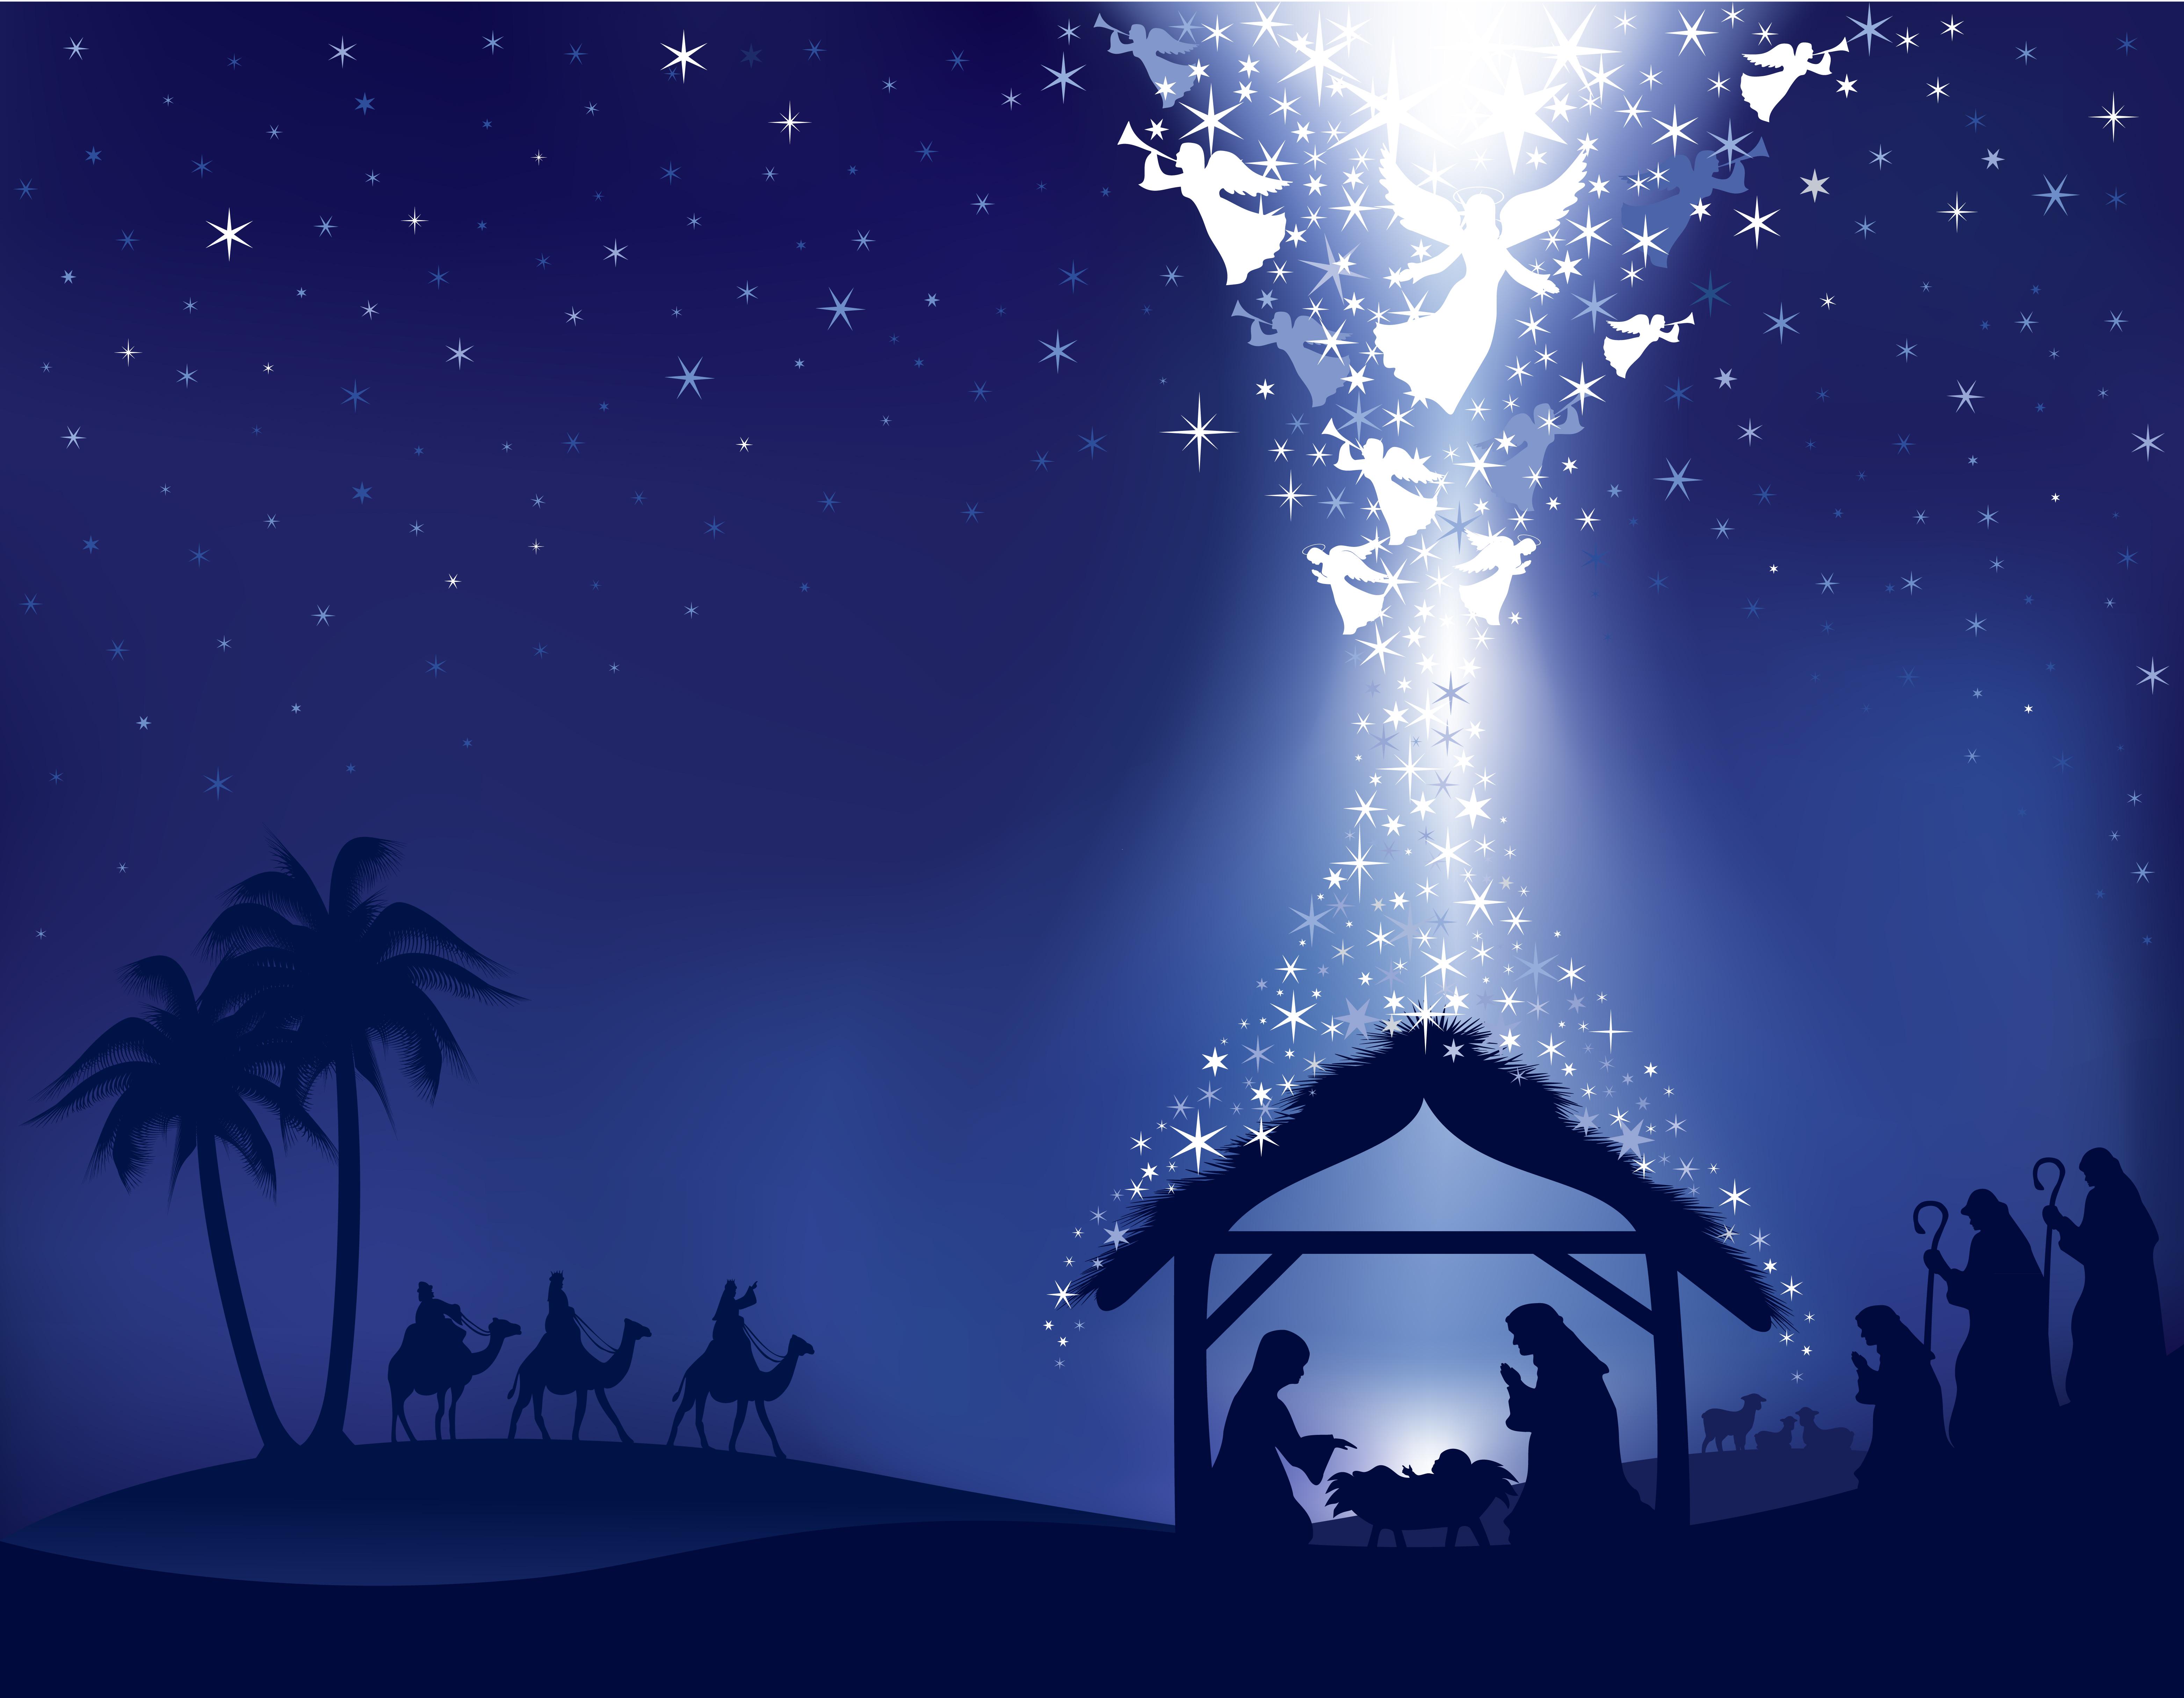 Clipart Christmas Nativity Scene